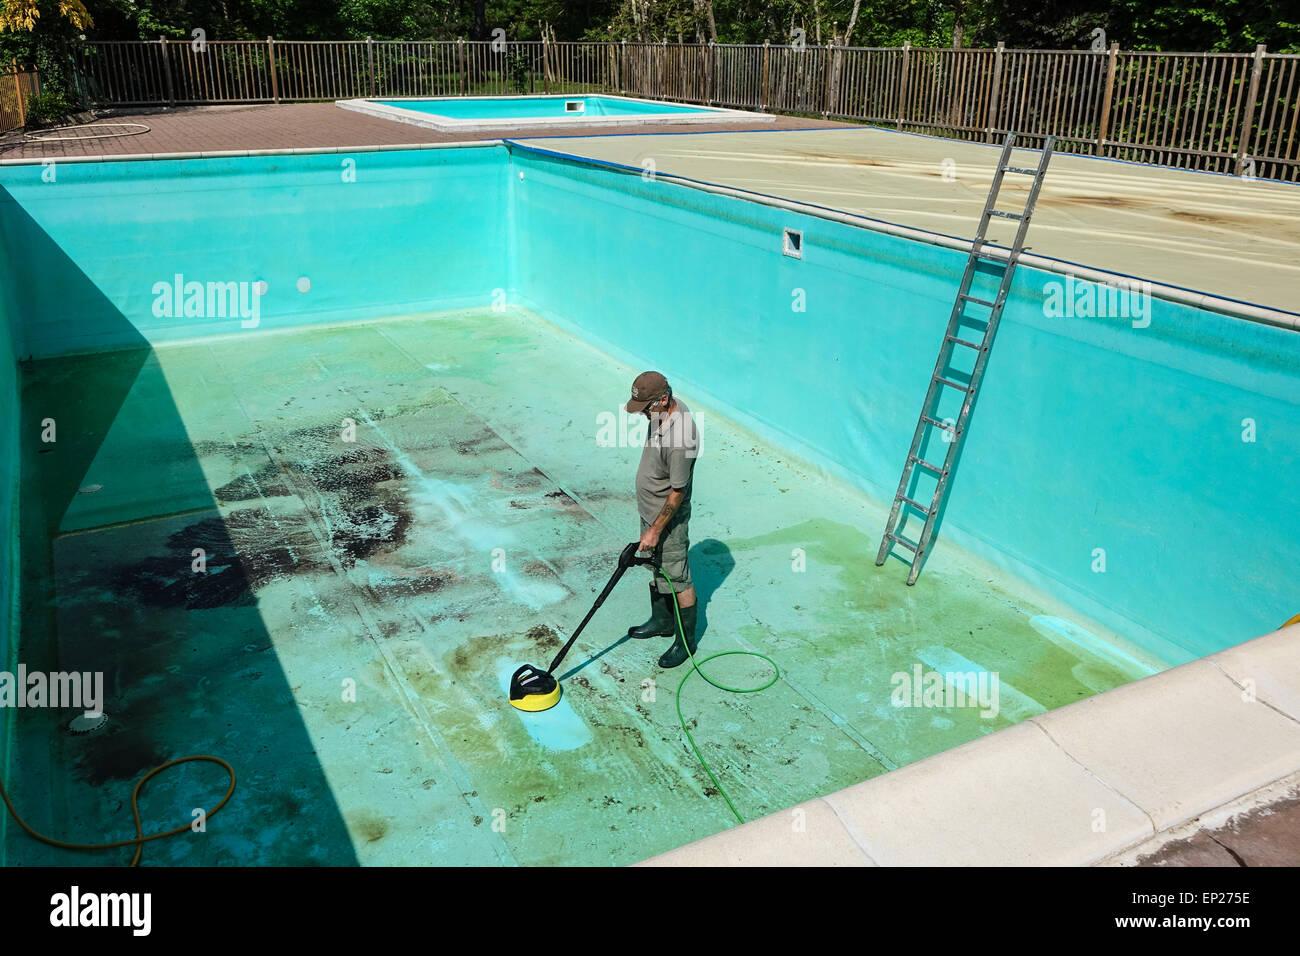 Swimming Pool Pressure Washing : Karcher pressure washer power jet wash patio attachment